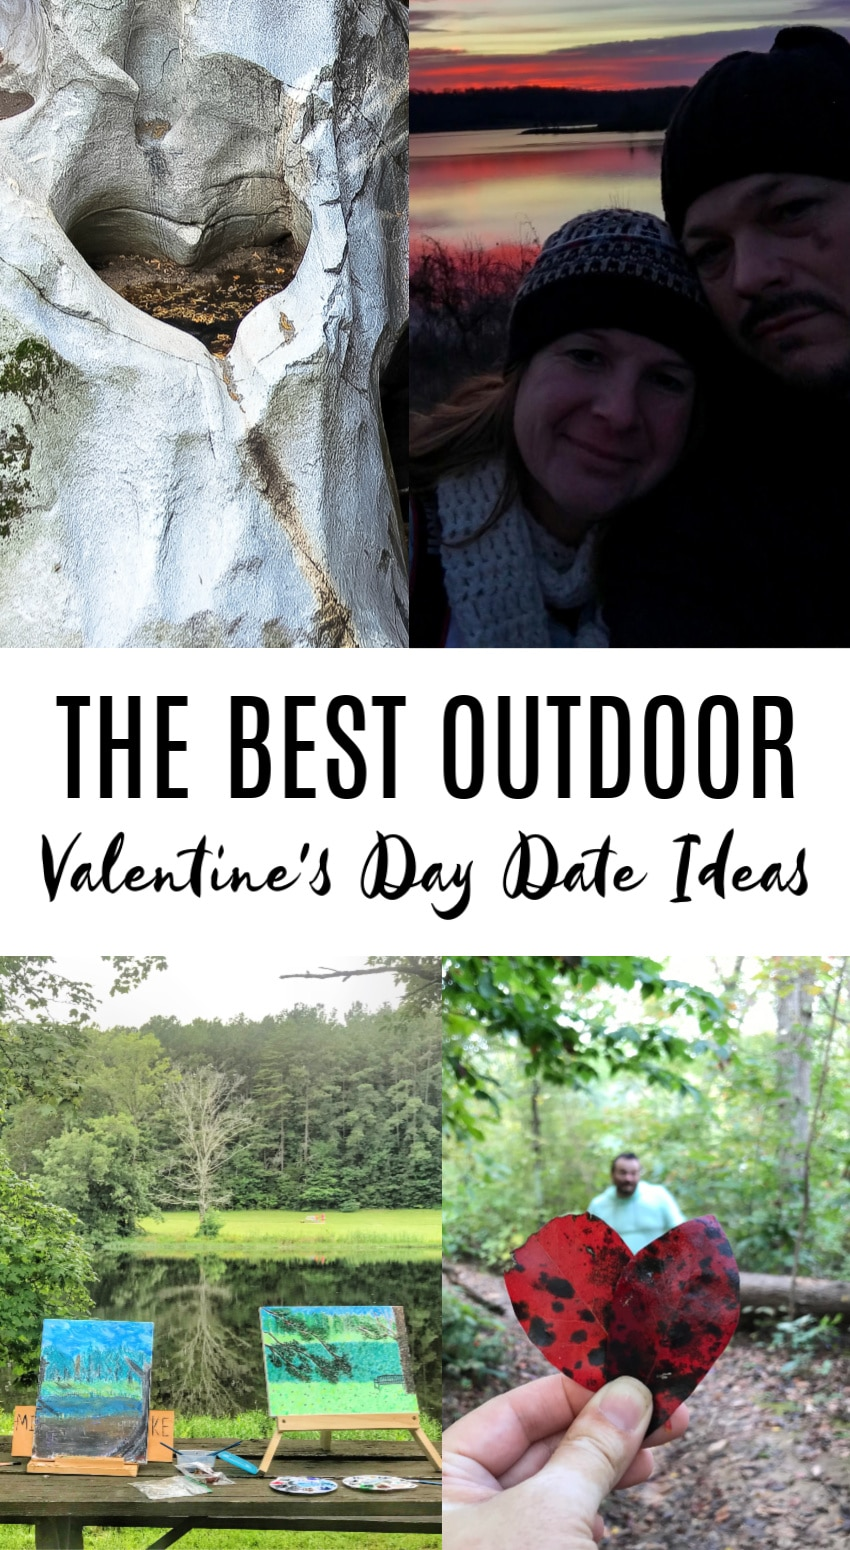 Outdoor Valentine's Day date ideas Pinterest image.